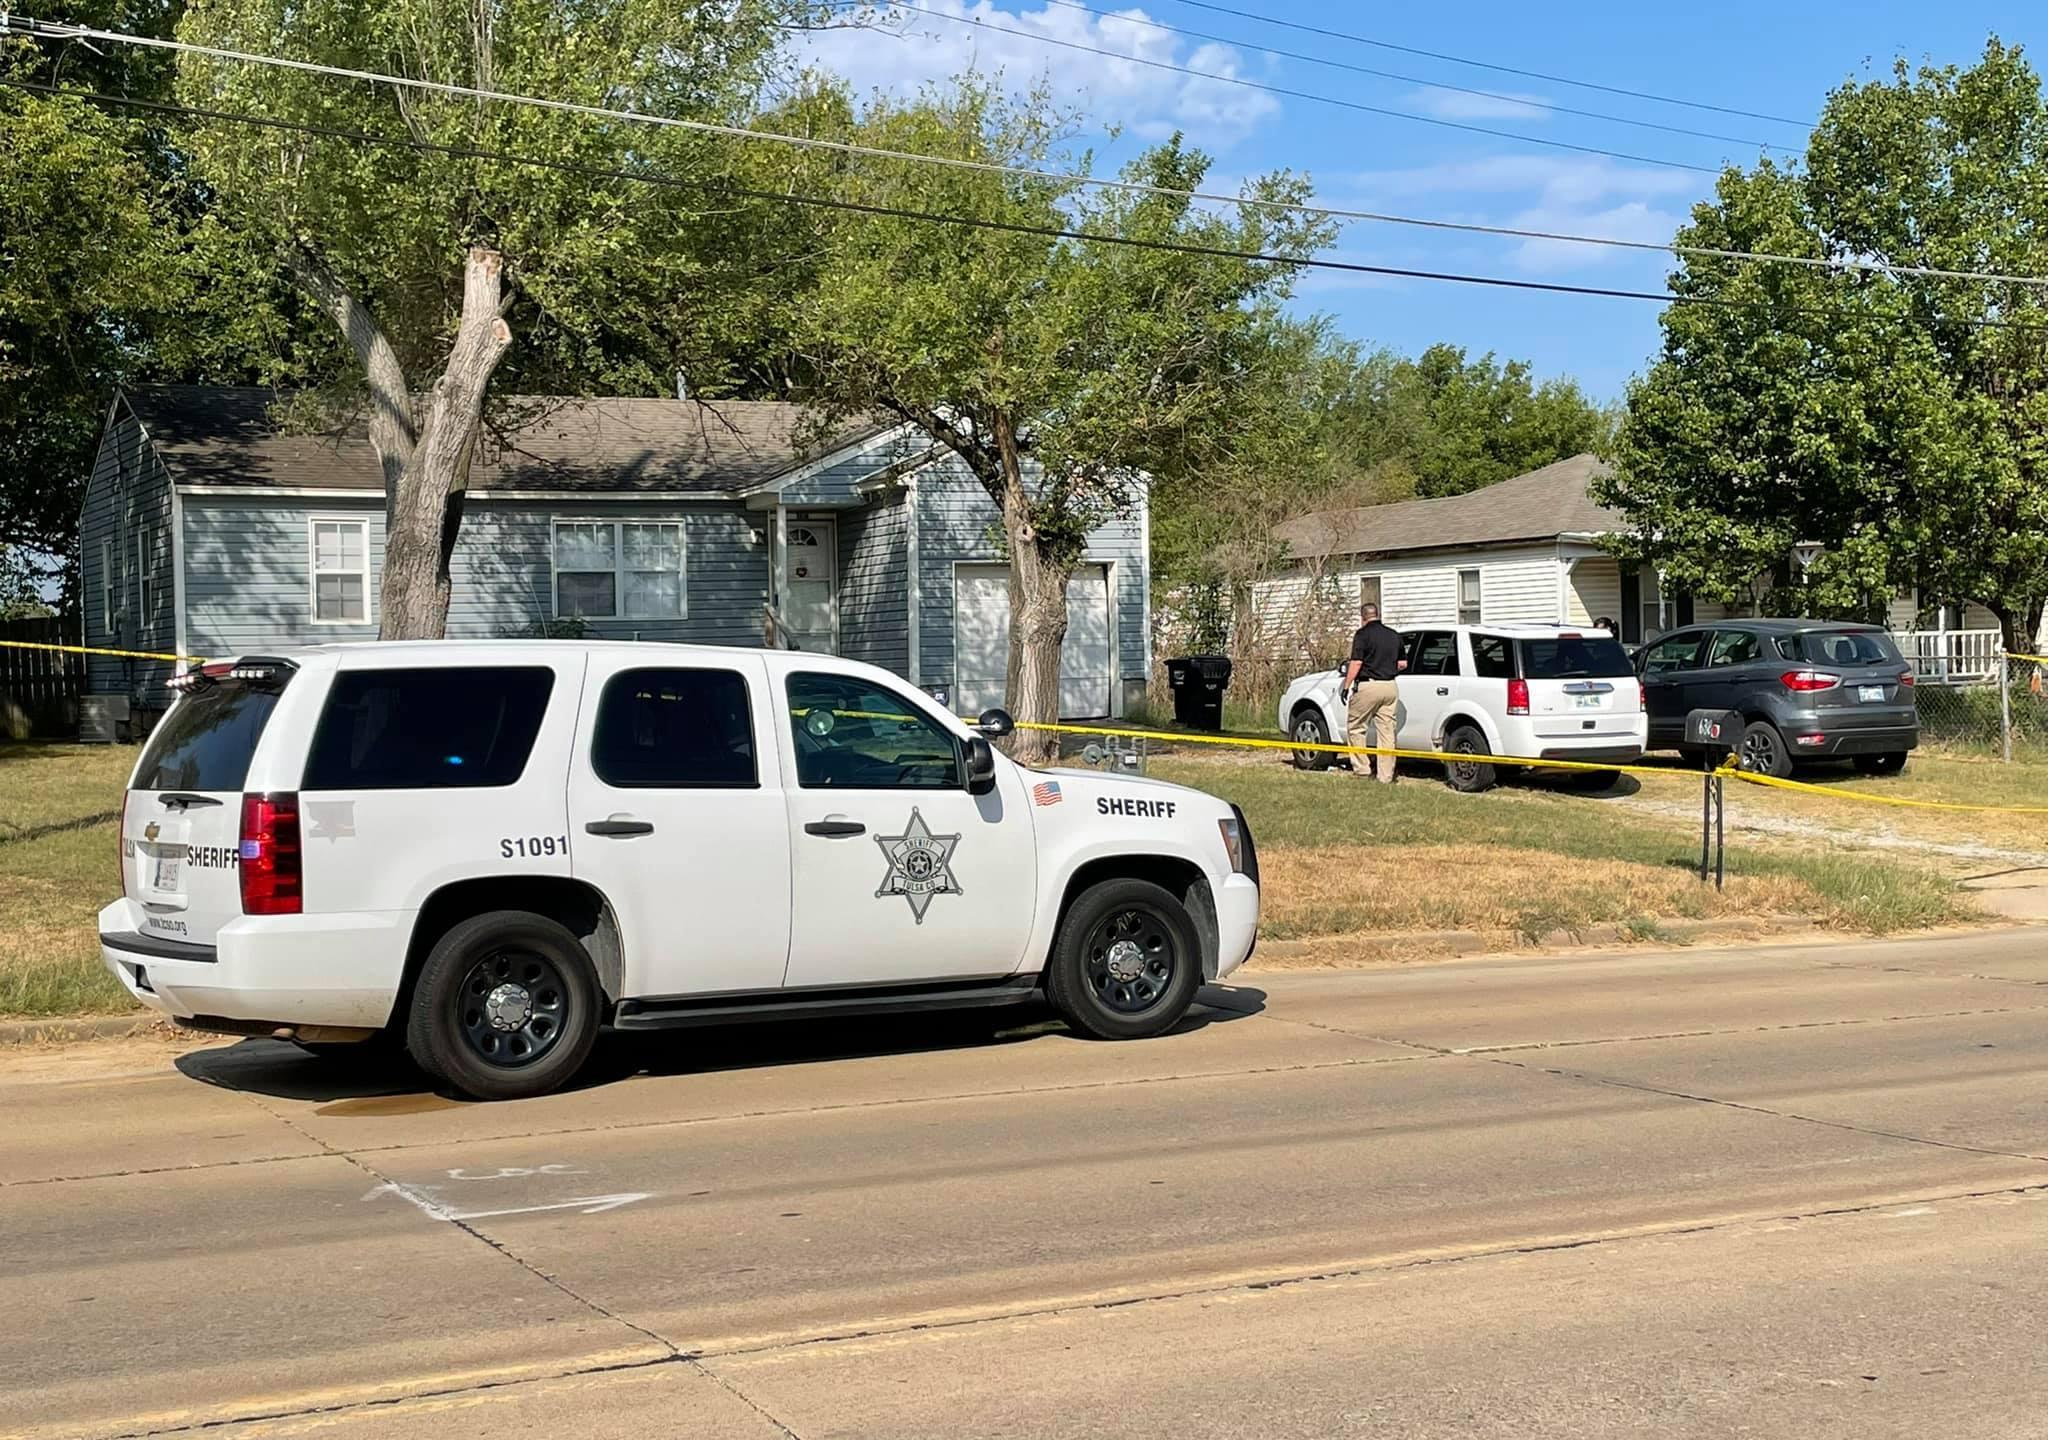 Tulsa County body found